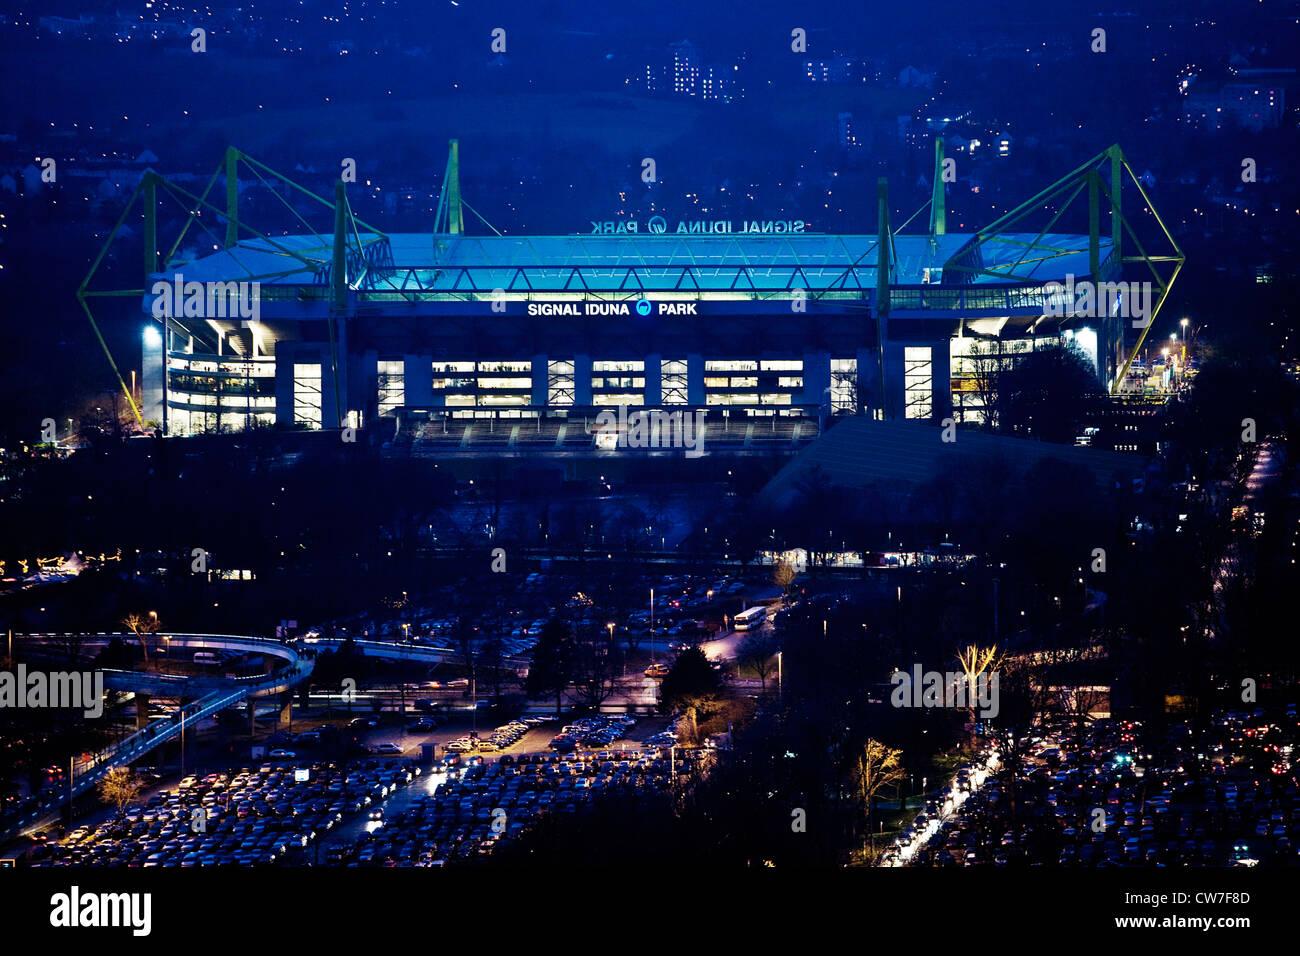 stadium of Borussia Dortmund, Signal Iduna Park, Germany, North Rhine-Westphalia, Ruhr Area, Dortmund - Stock Image